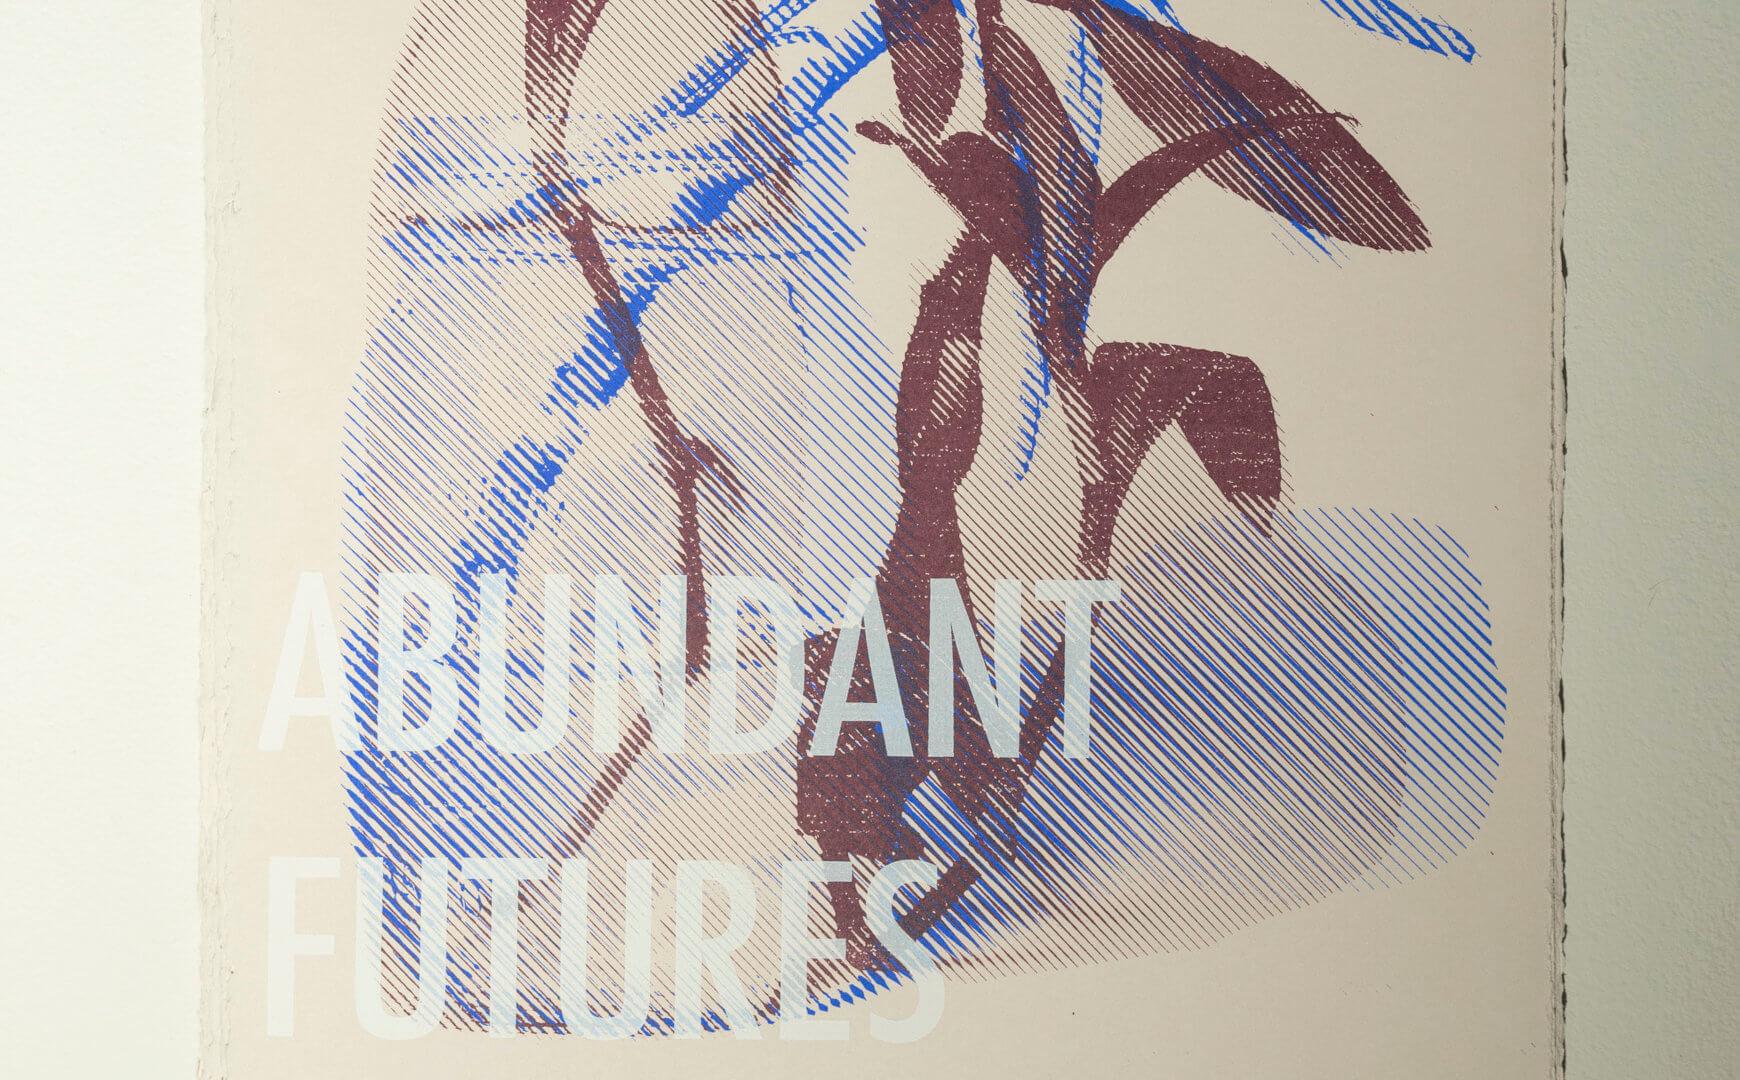 "Abundant futures - posters. Free for gallery visitors. Screen prints. Each 15 x 11"". 2021.. Image credit: Sarah Fuller."